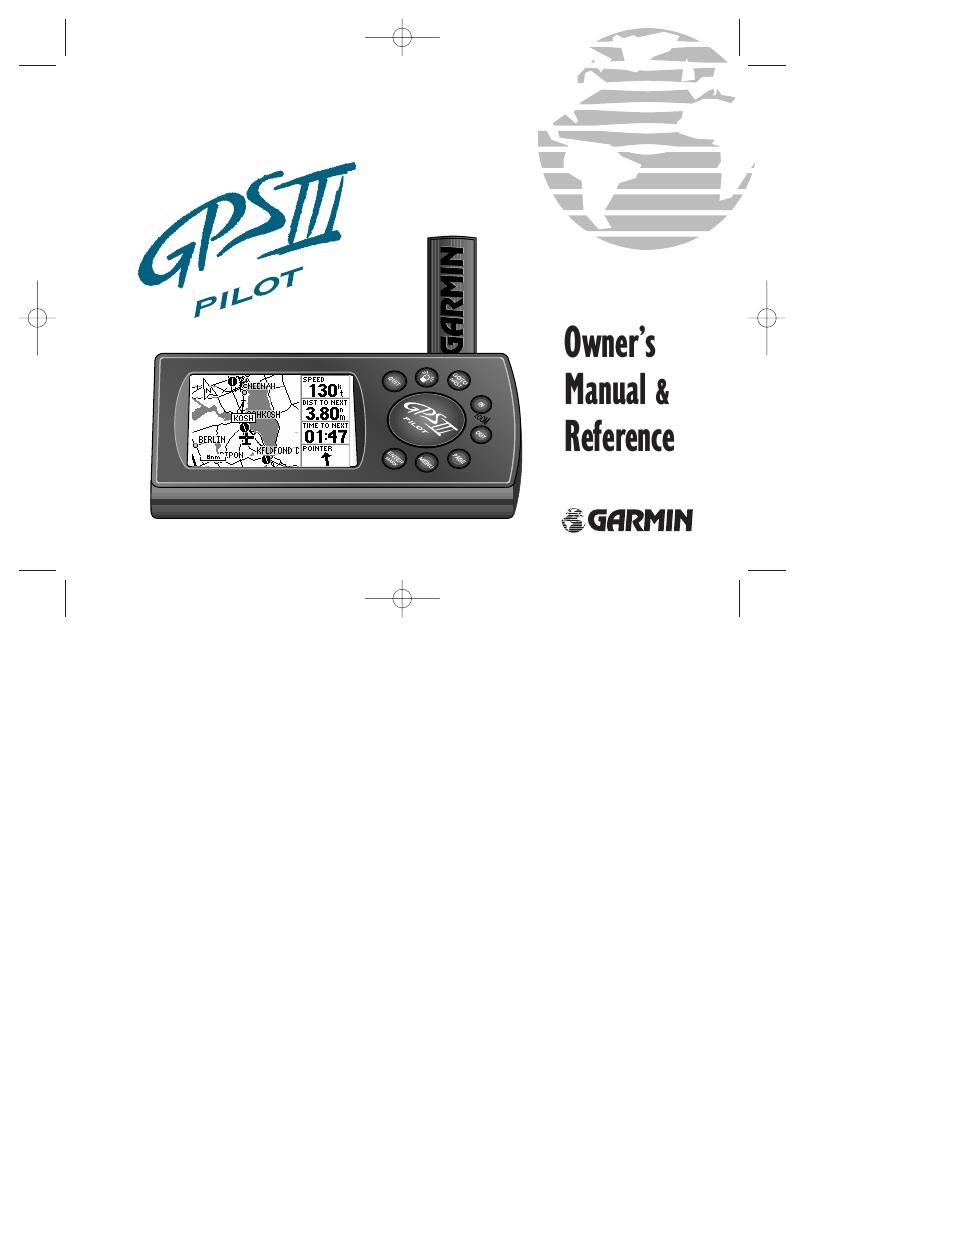 garmin gps iii pilot user manual 112 pages rh manualsdir com Garmin Updates garmin pilot iii manual